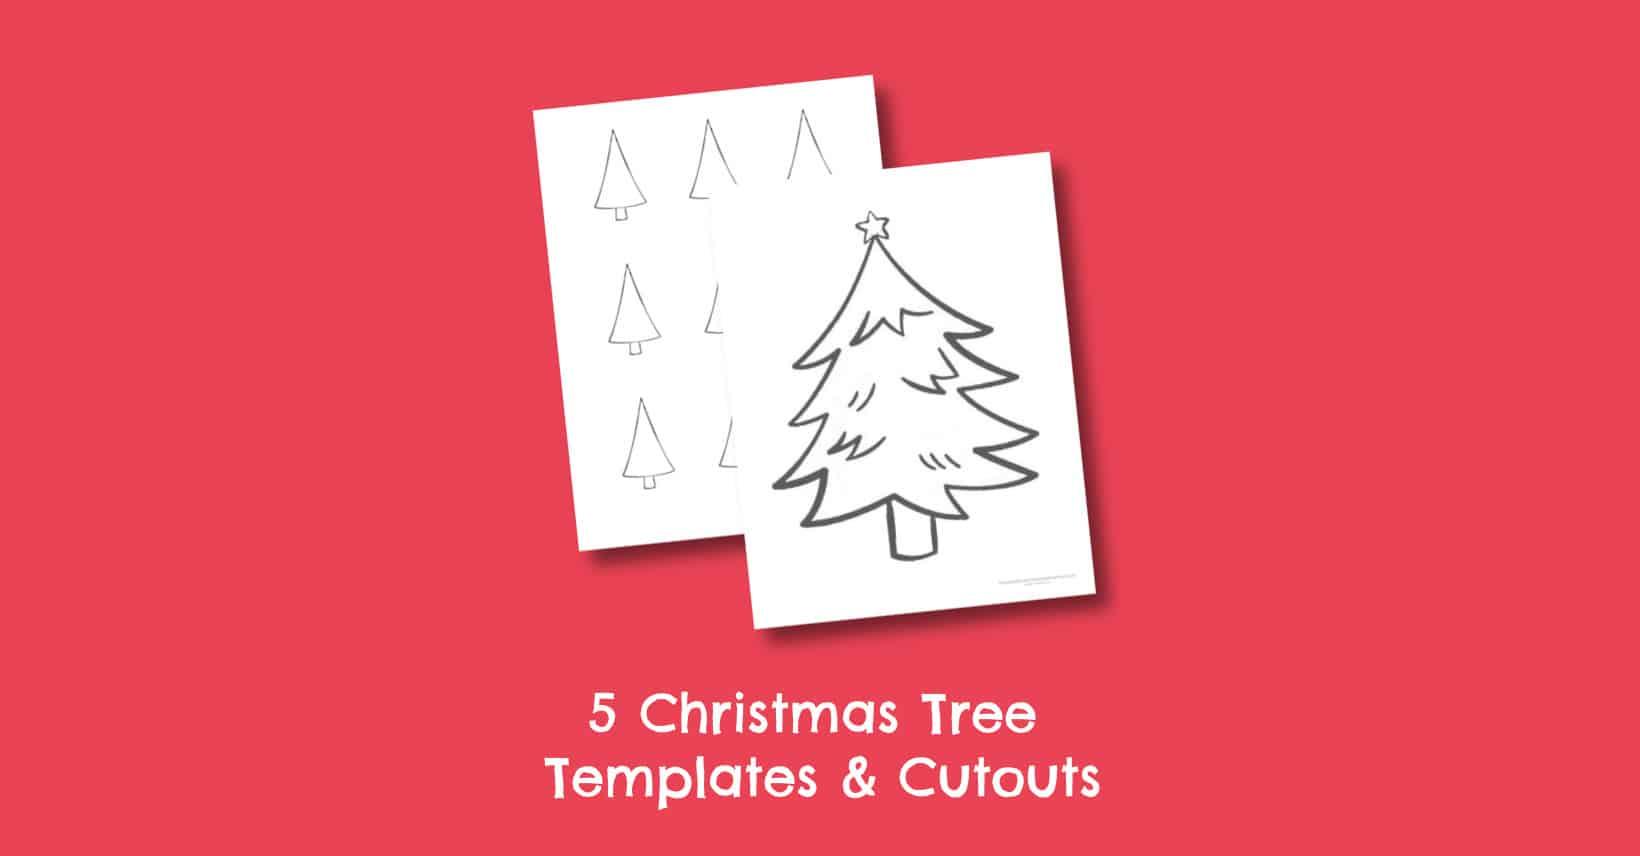 5 Free Printable Christmas Tree Templates and Cutouts